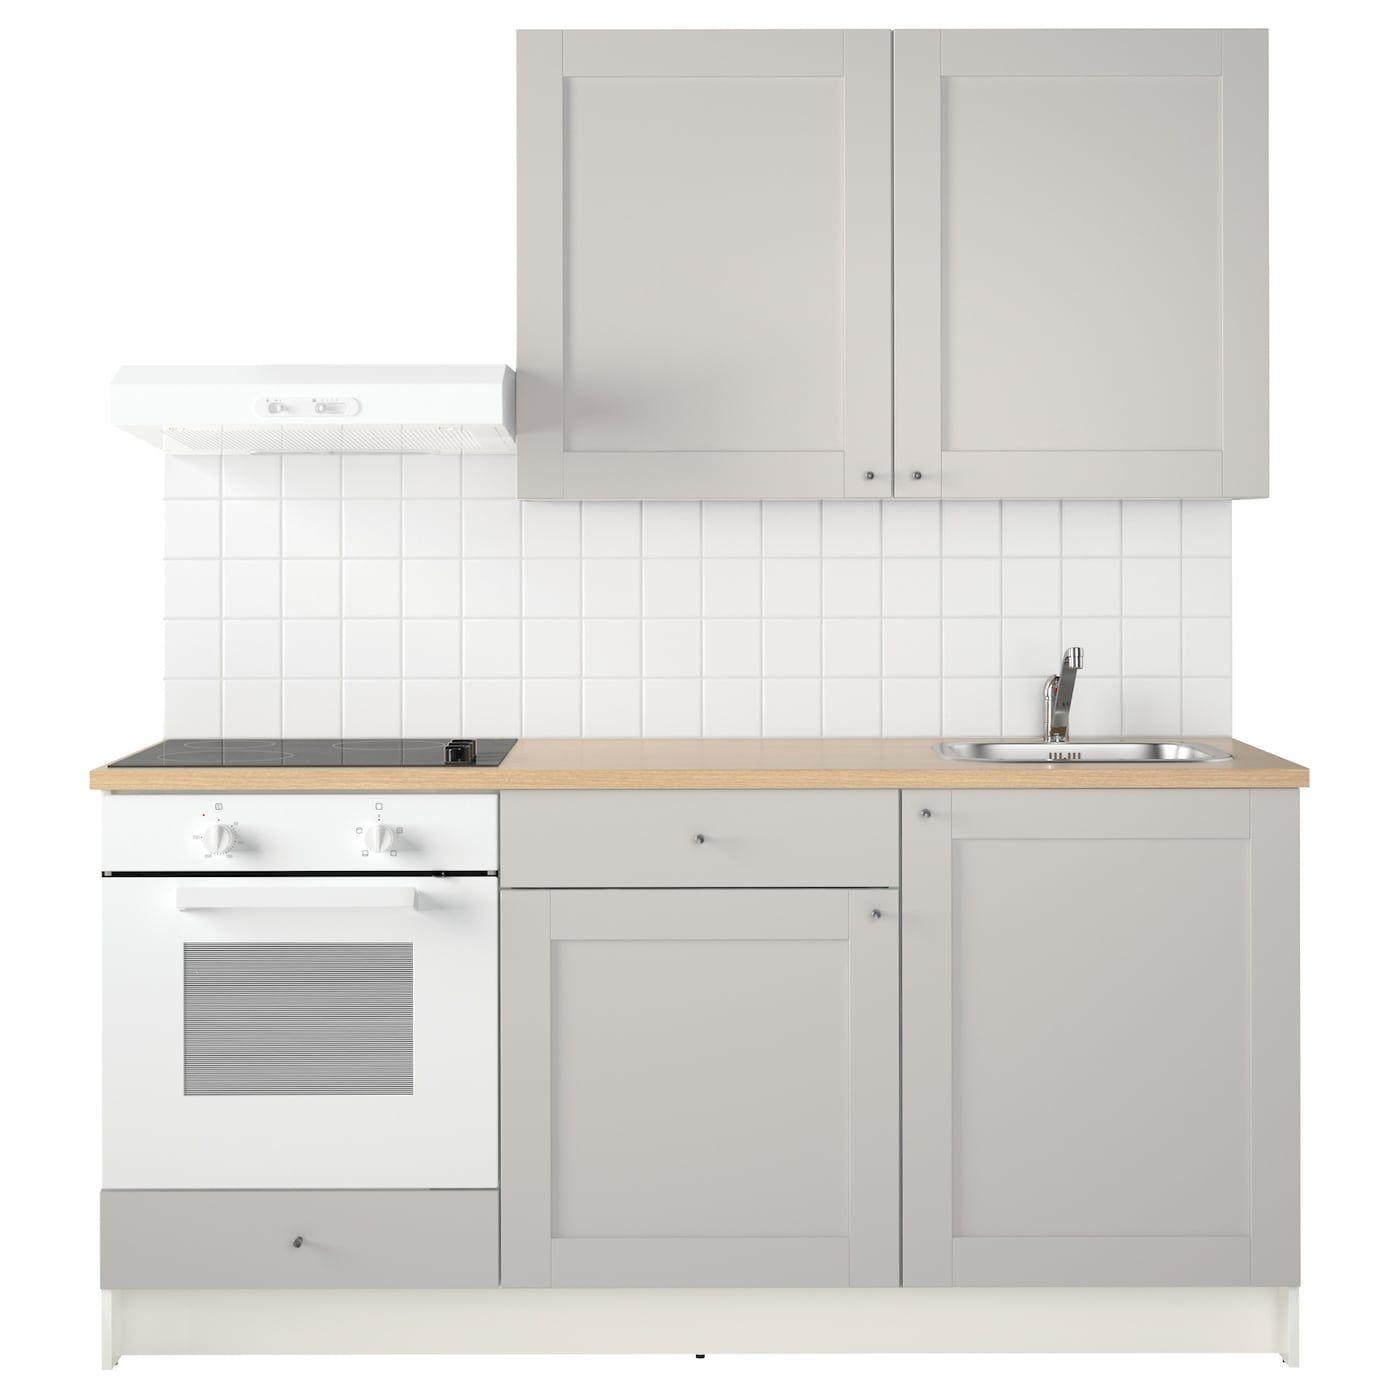 Knoxhult Kokken Gra Ikea In 2020 Schrank Kuche Graue Kuchen Kuchenprodukte